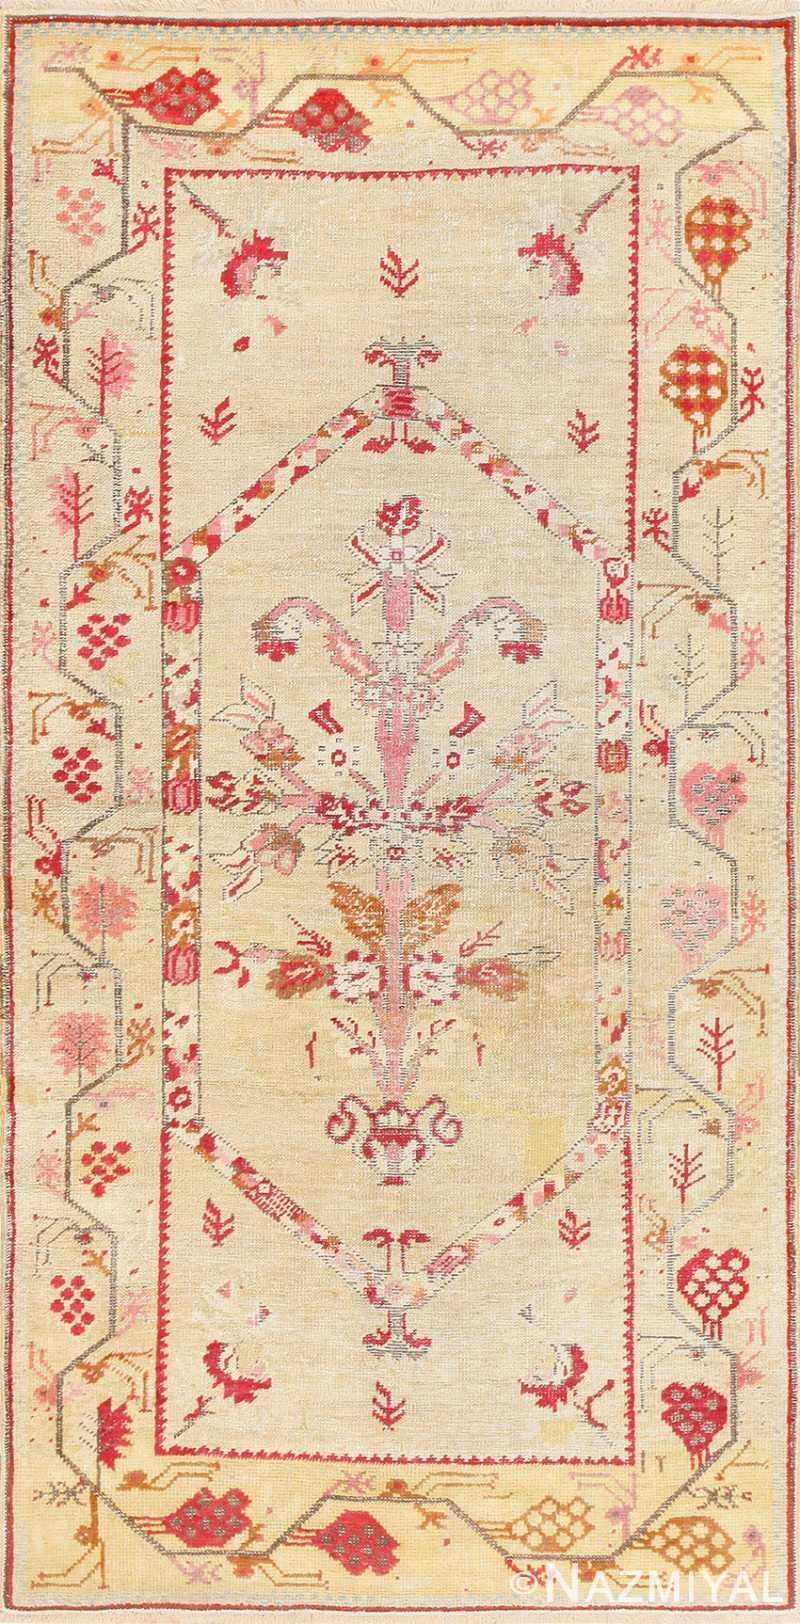 Antique Shabby Chic Tribal Turkish Ghiordes Rug 50640 Nazmiyal